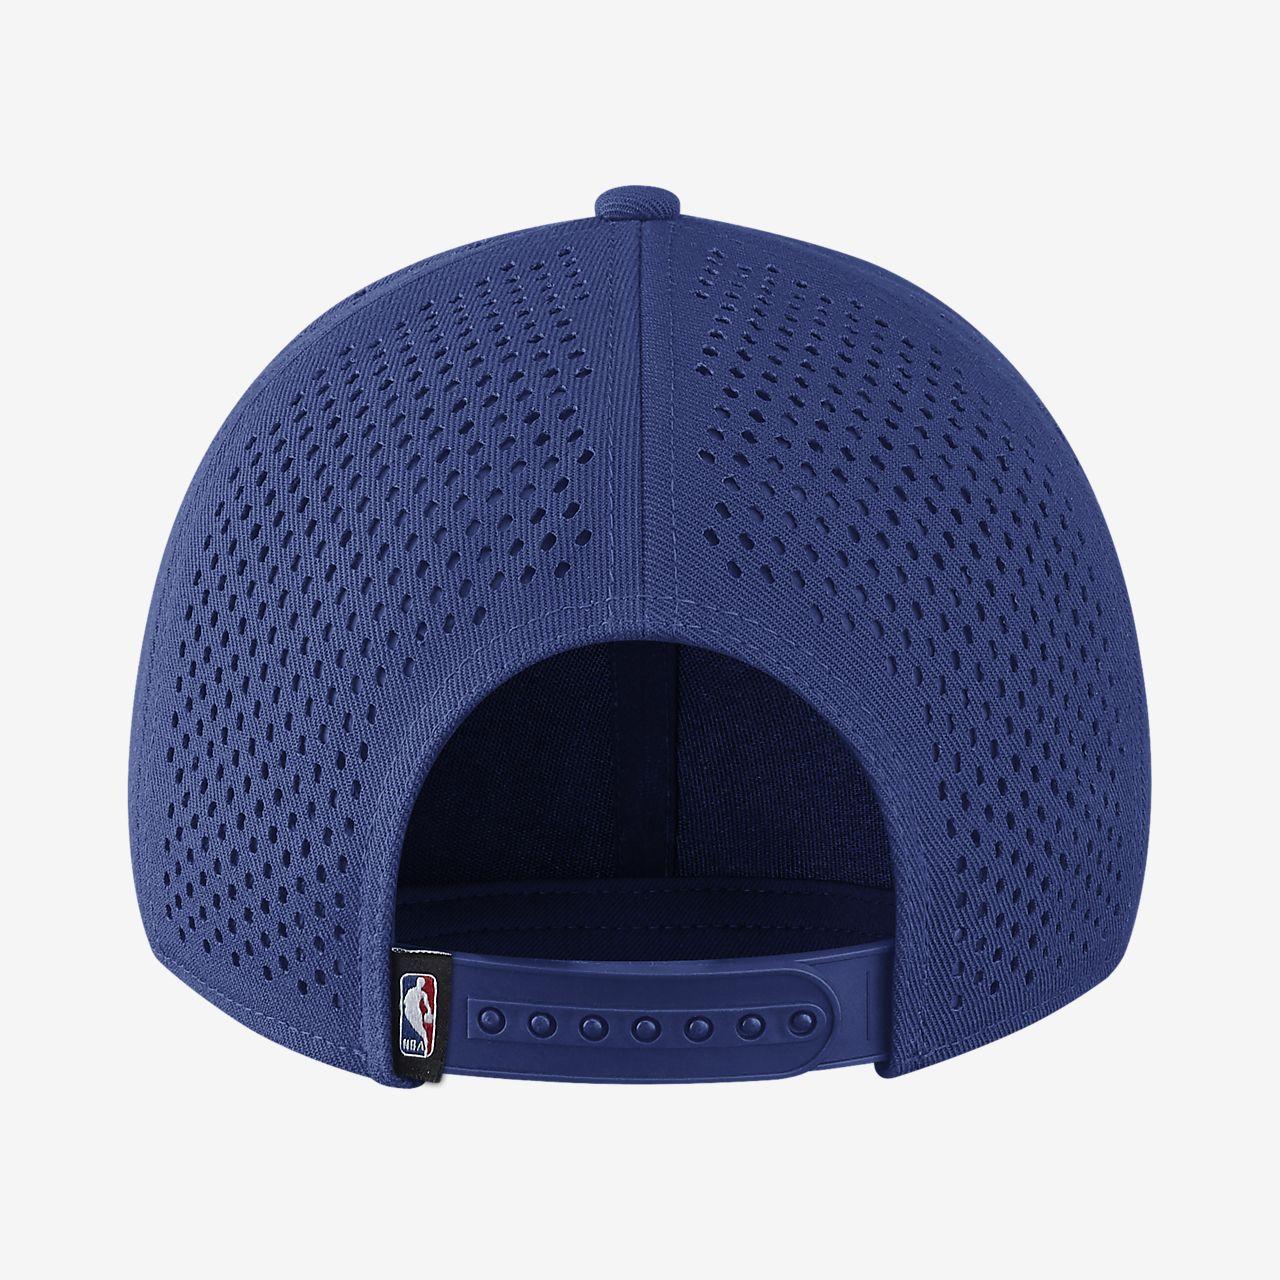 ... New York Knicks Nike AeroBill Classic99 Unisex Adjustable NBA Hat